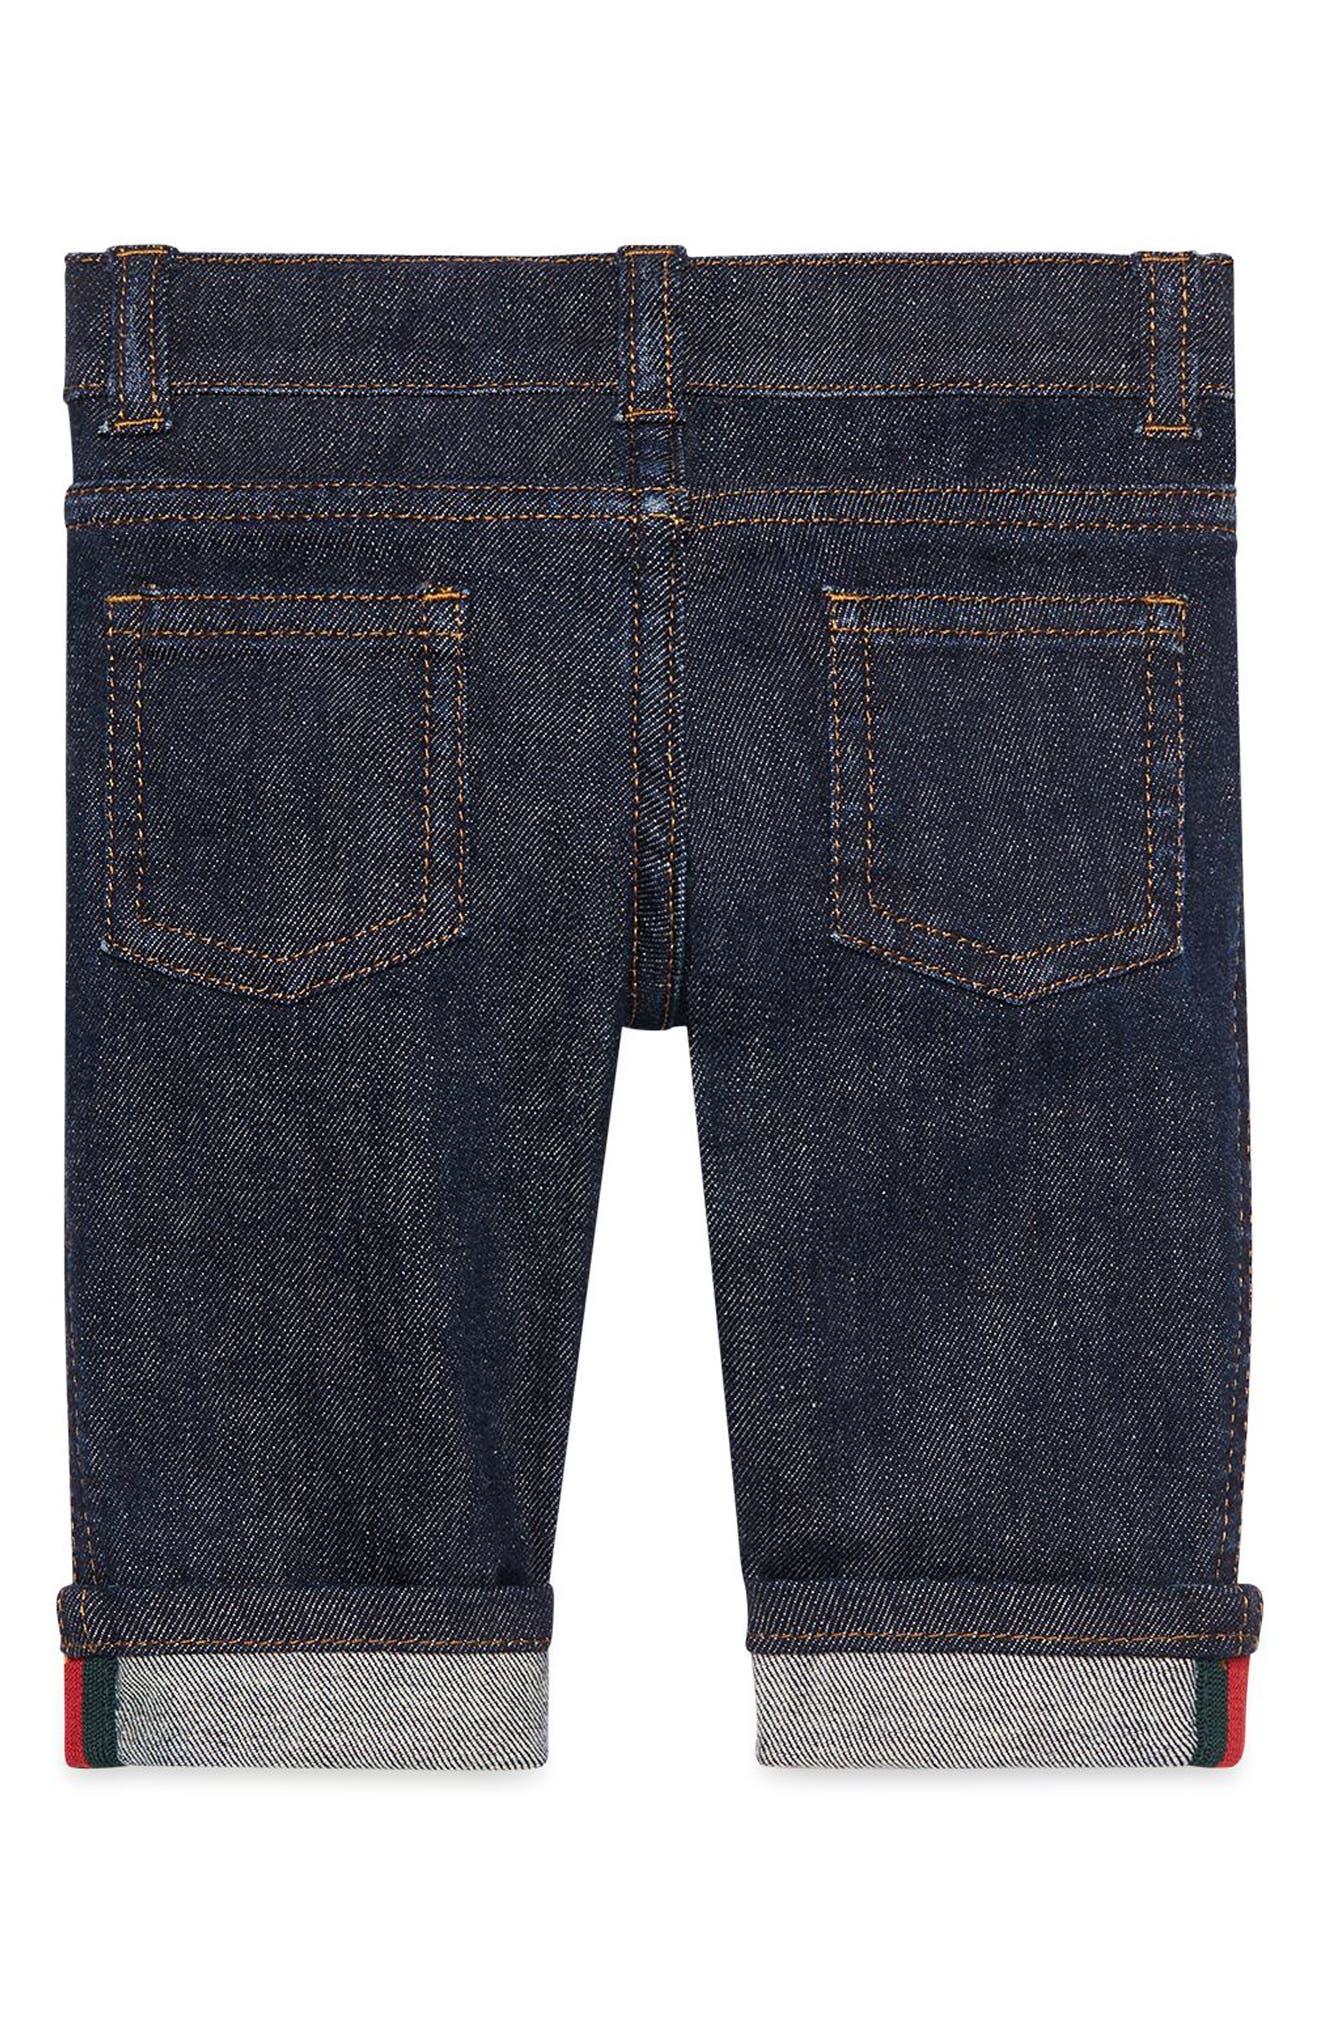 Straight Leg Jeans,                             Alternate thumbnail 2, color,                             Indigo